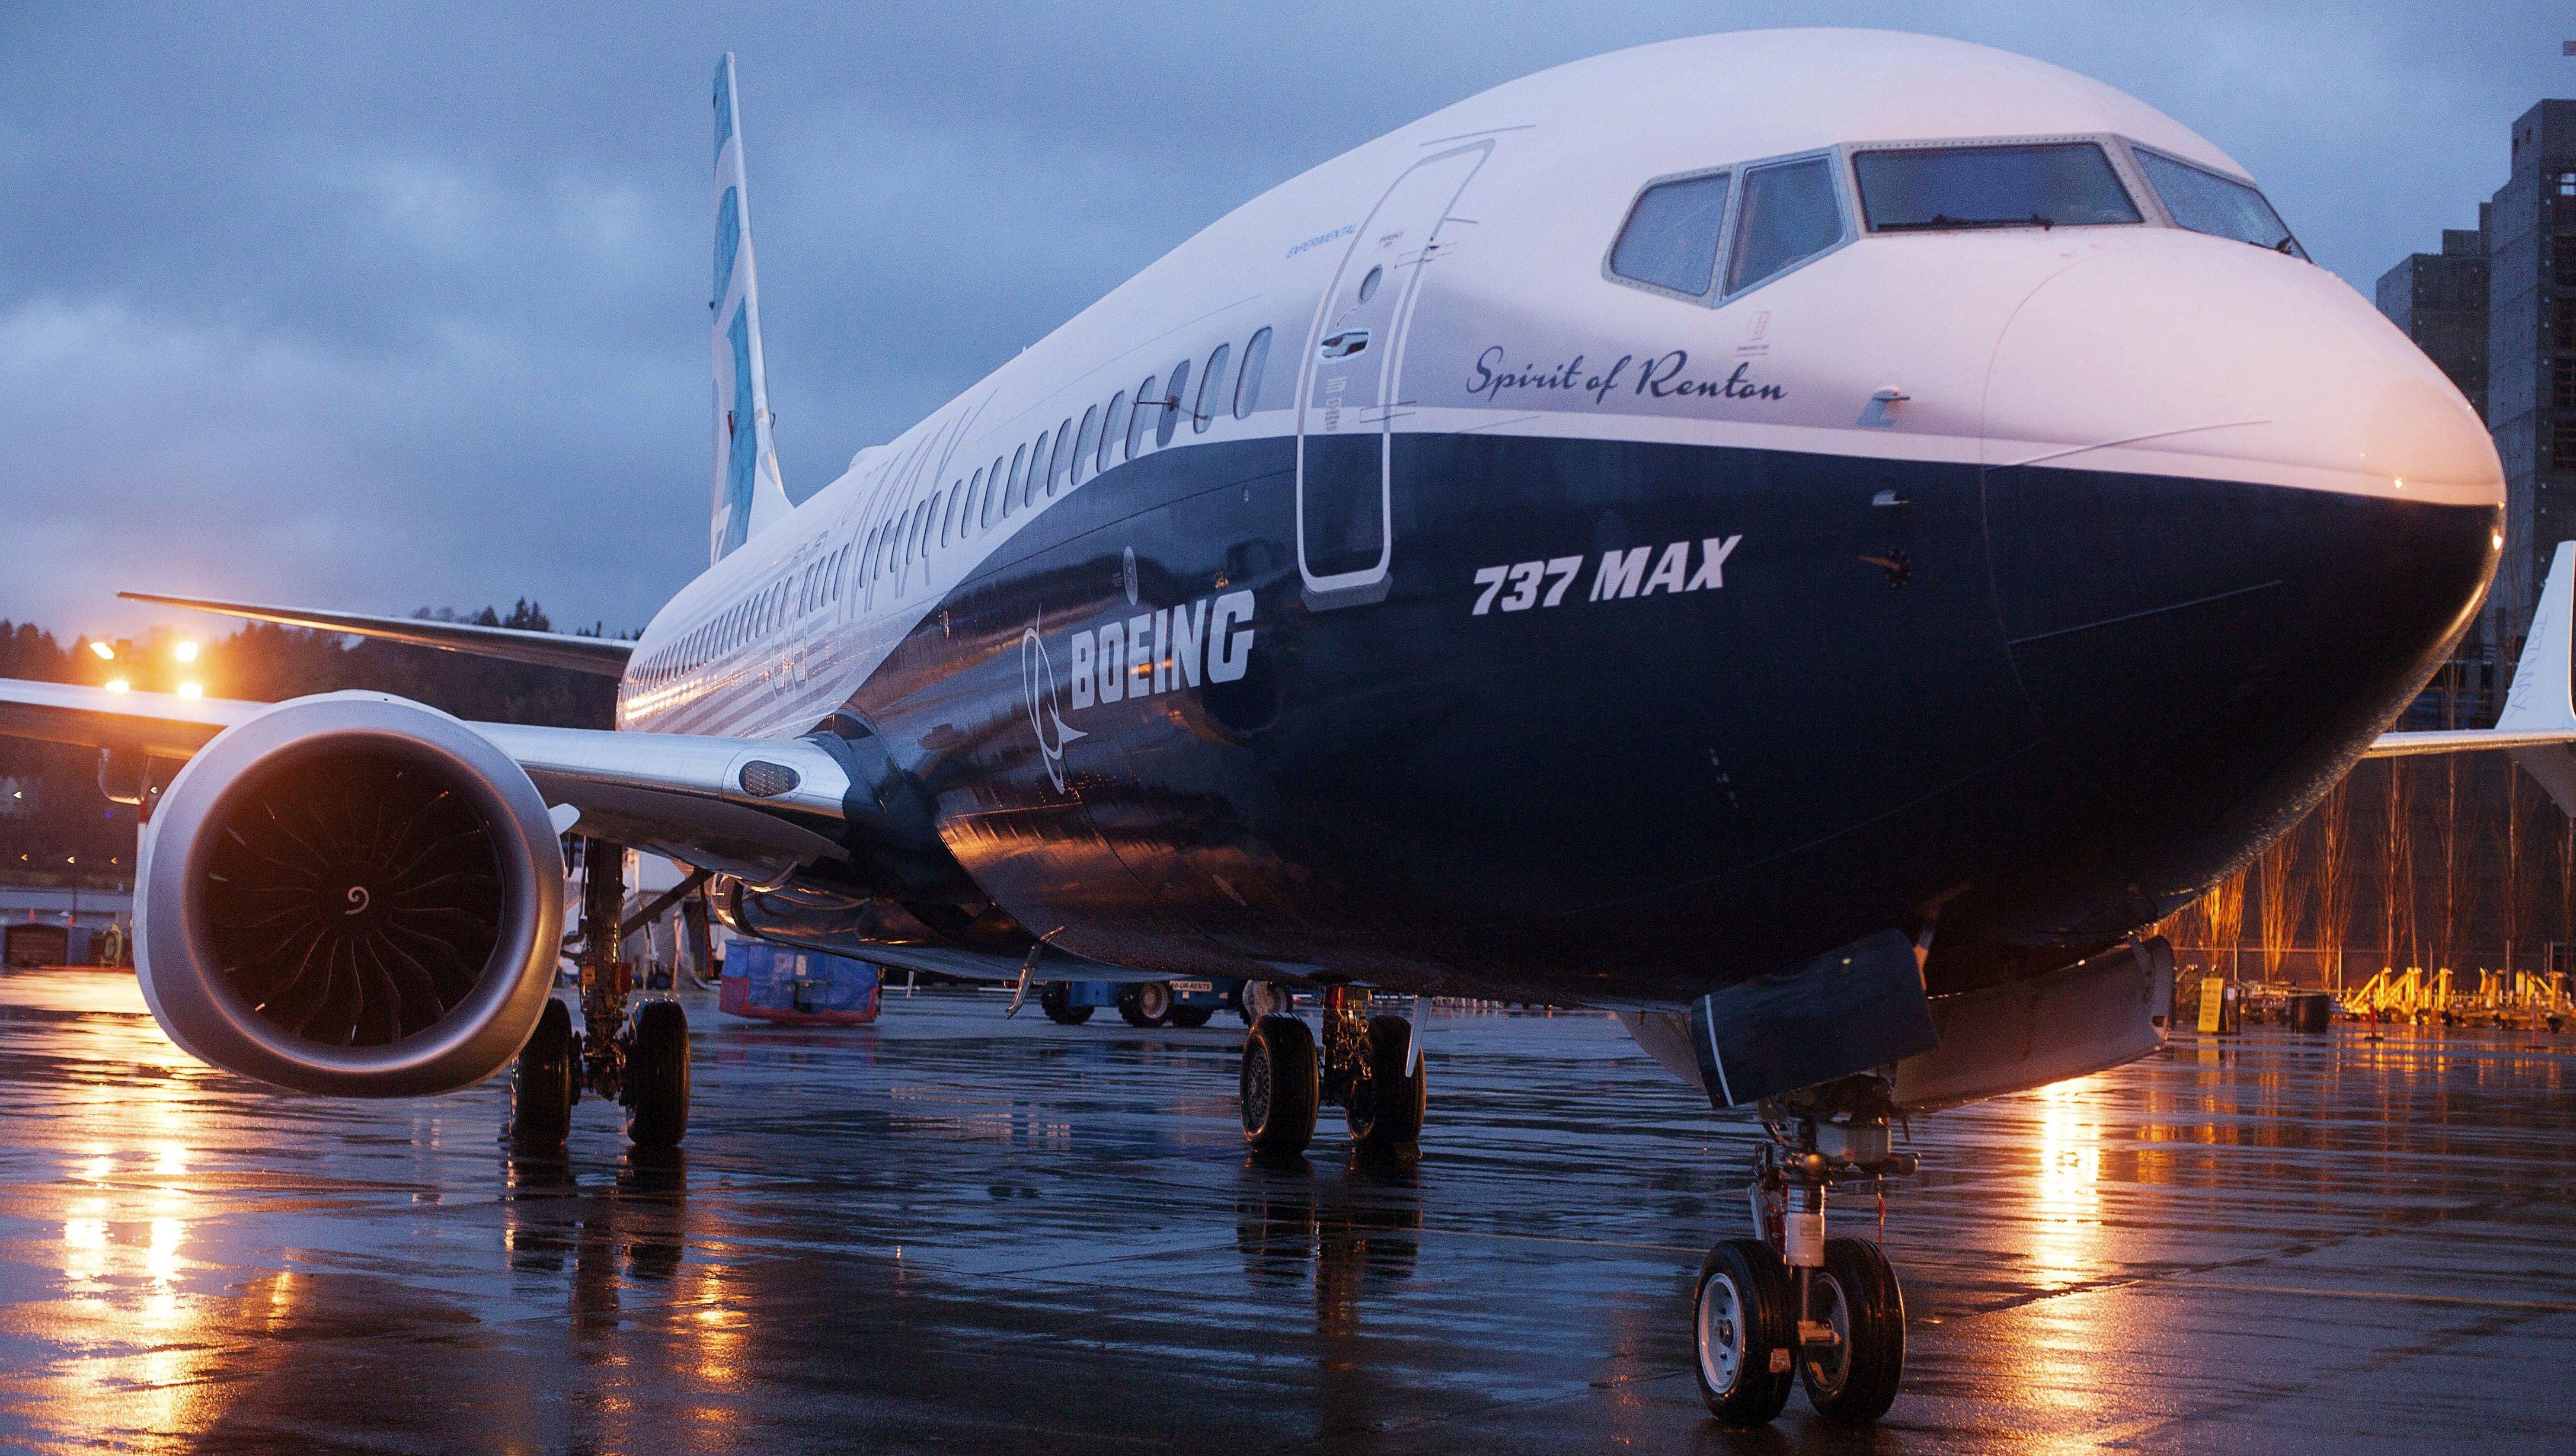 A Boeing 737 MAX 8 sits outside the hangar during a media tour of the Boeing 737 MAX at the Boeing plant in Renton, Washington.